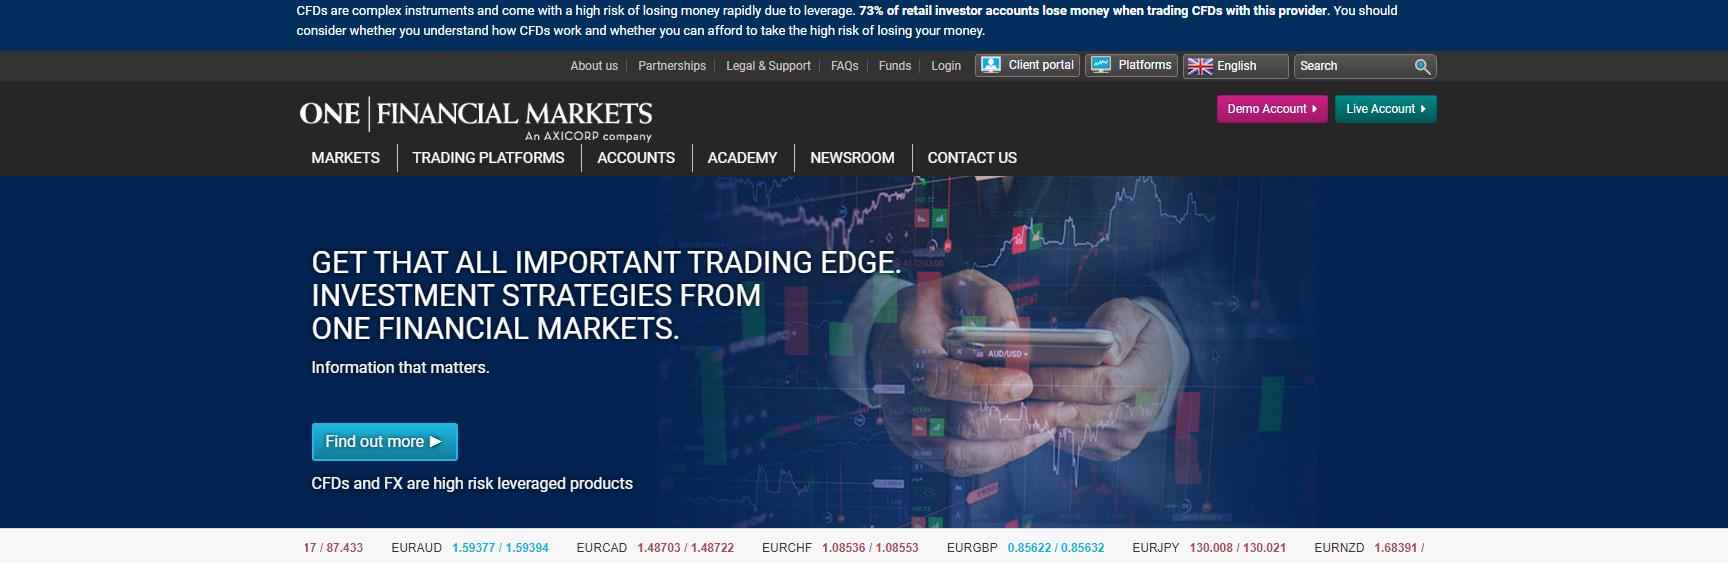 one financial markets официальный сайт обзор